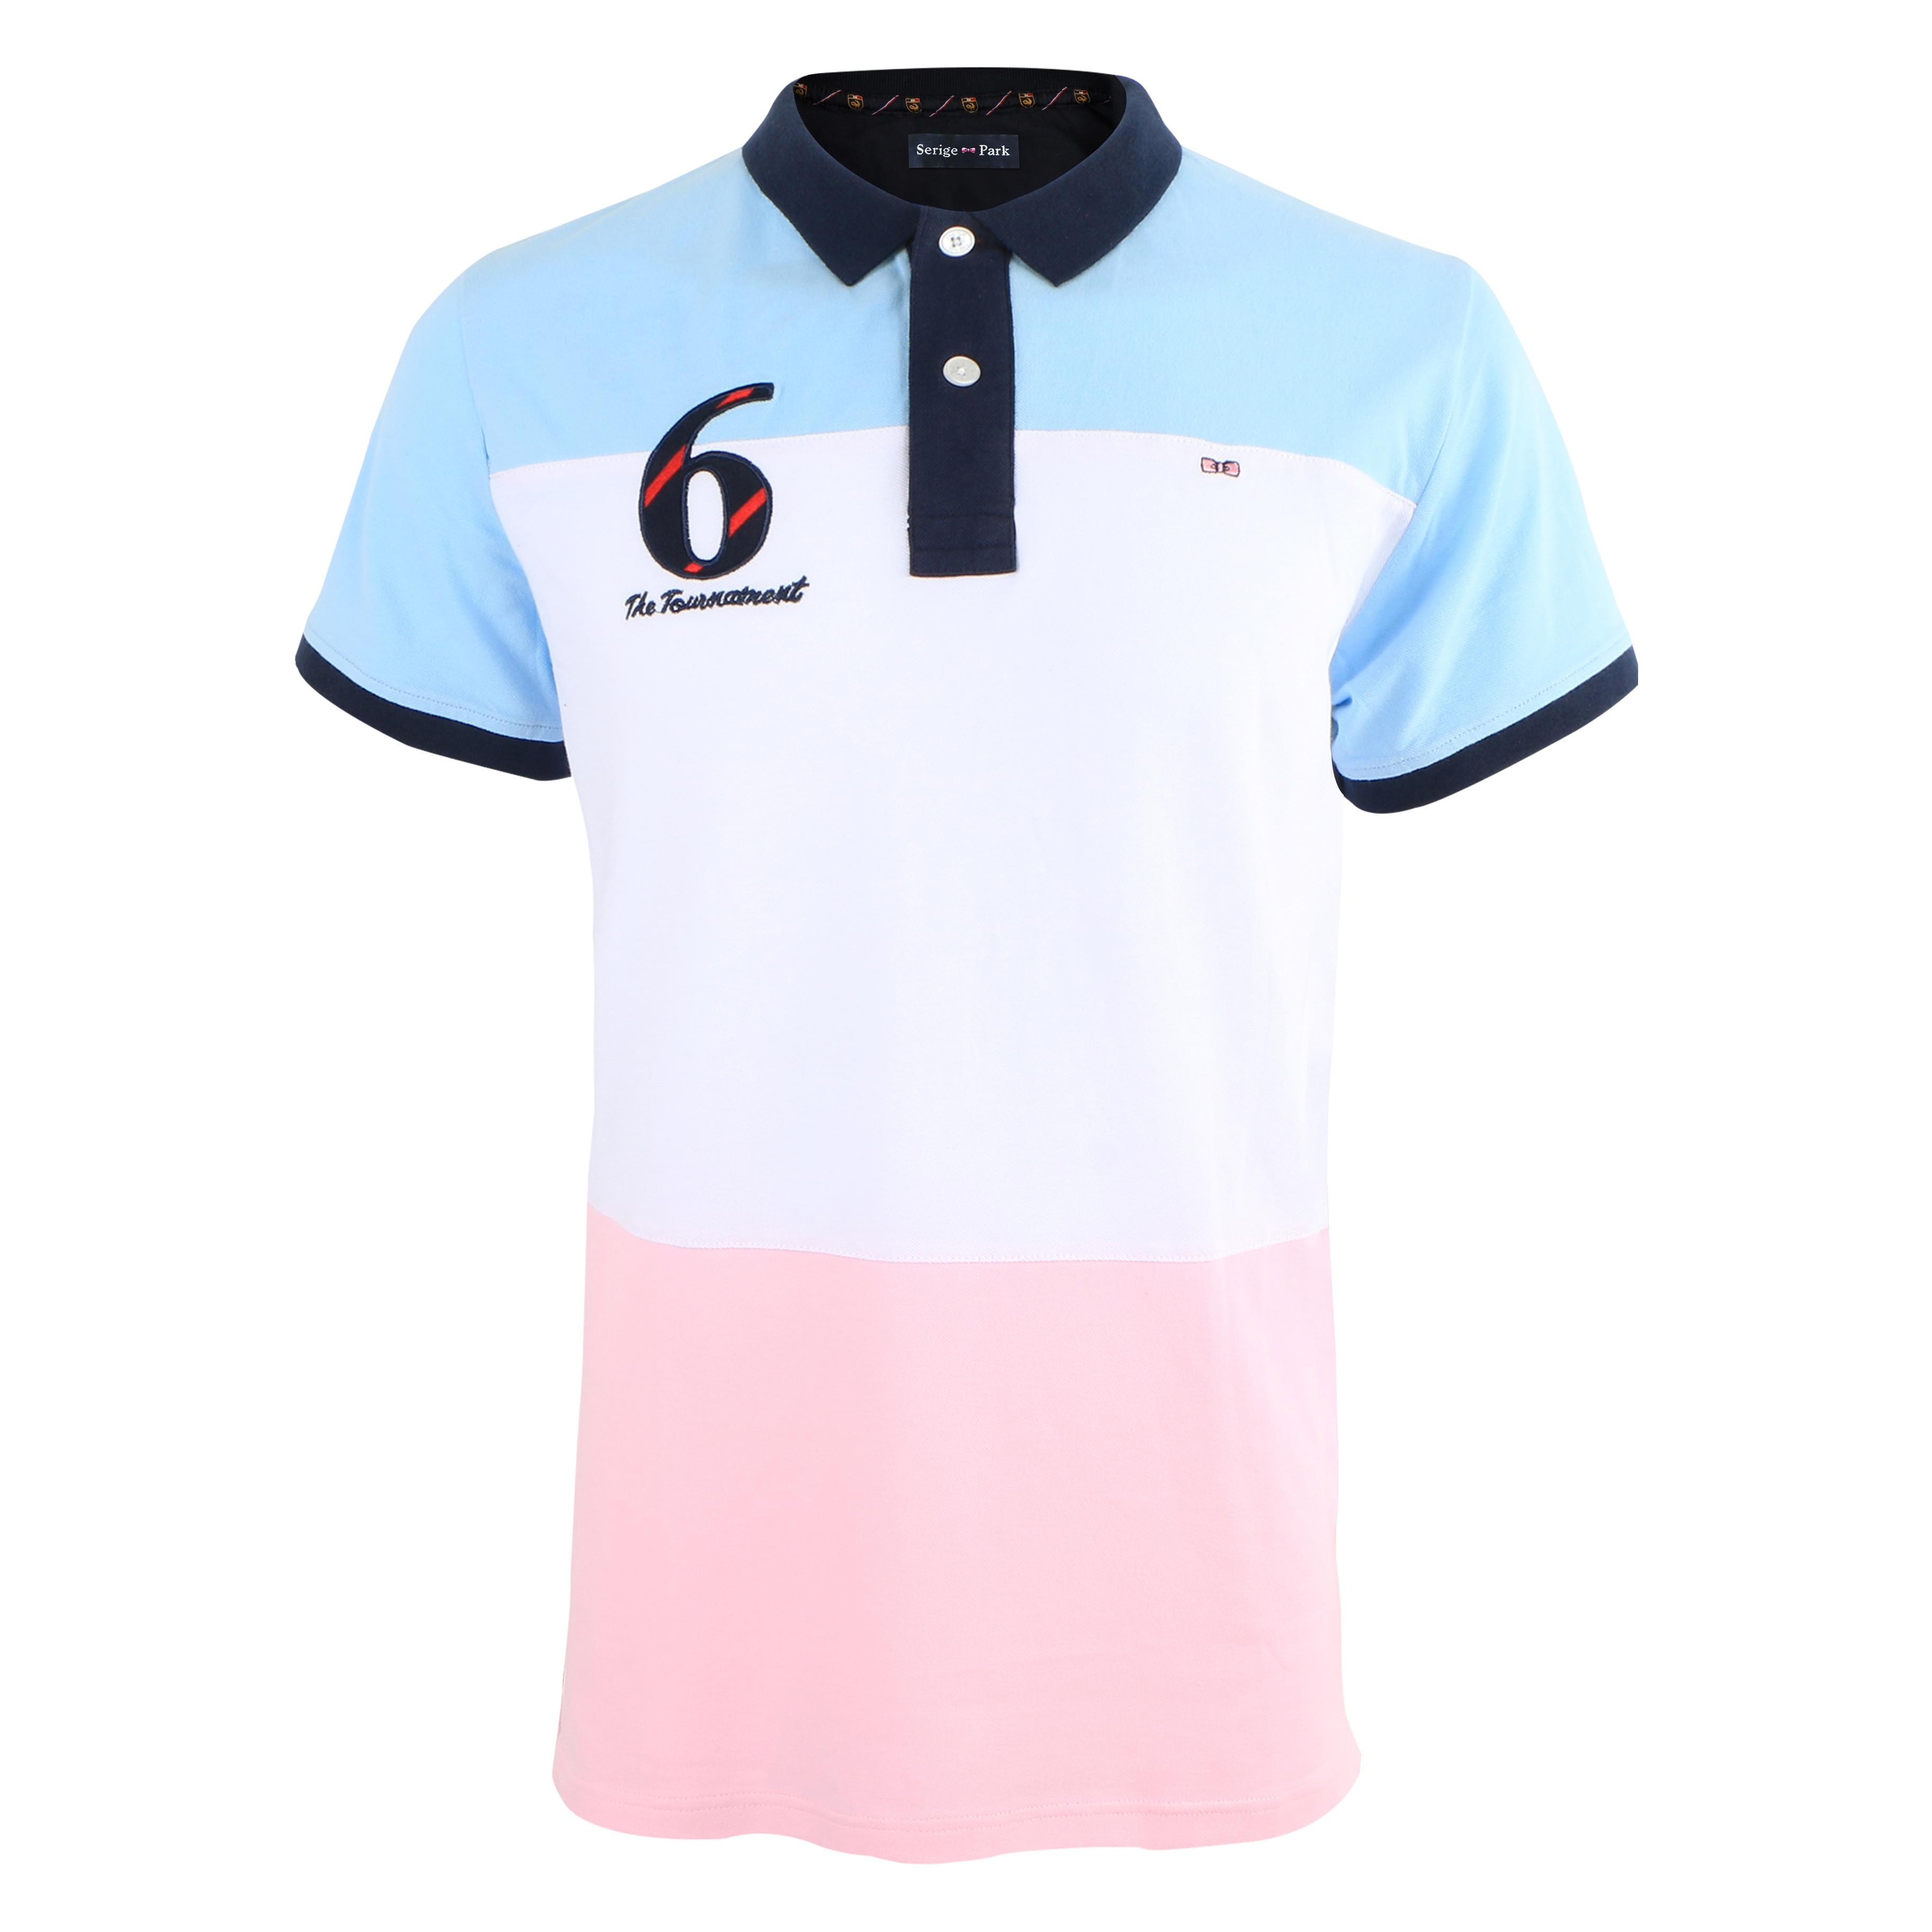 Fashion polo shirt para hombre eden park homme high quality cotton material summer collection футболка поло мужская